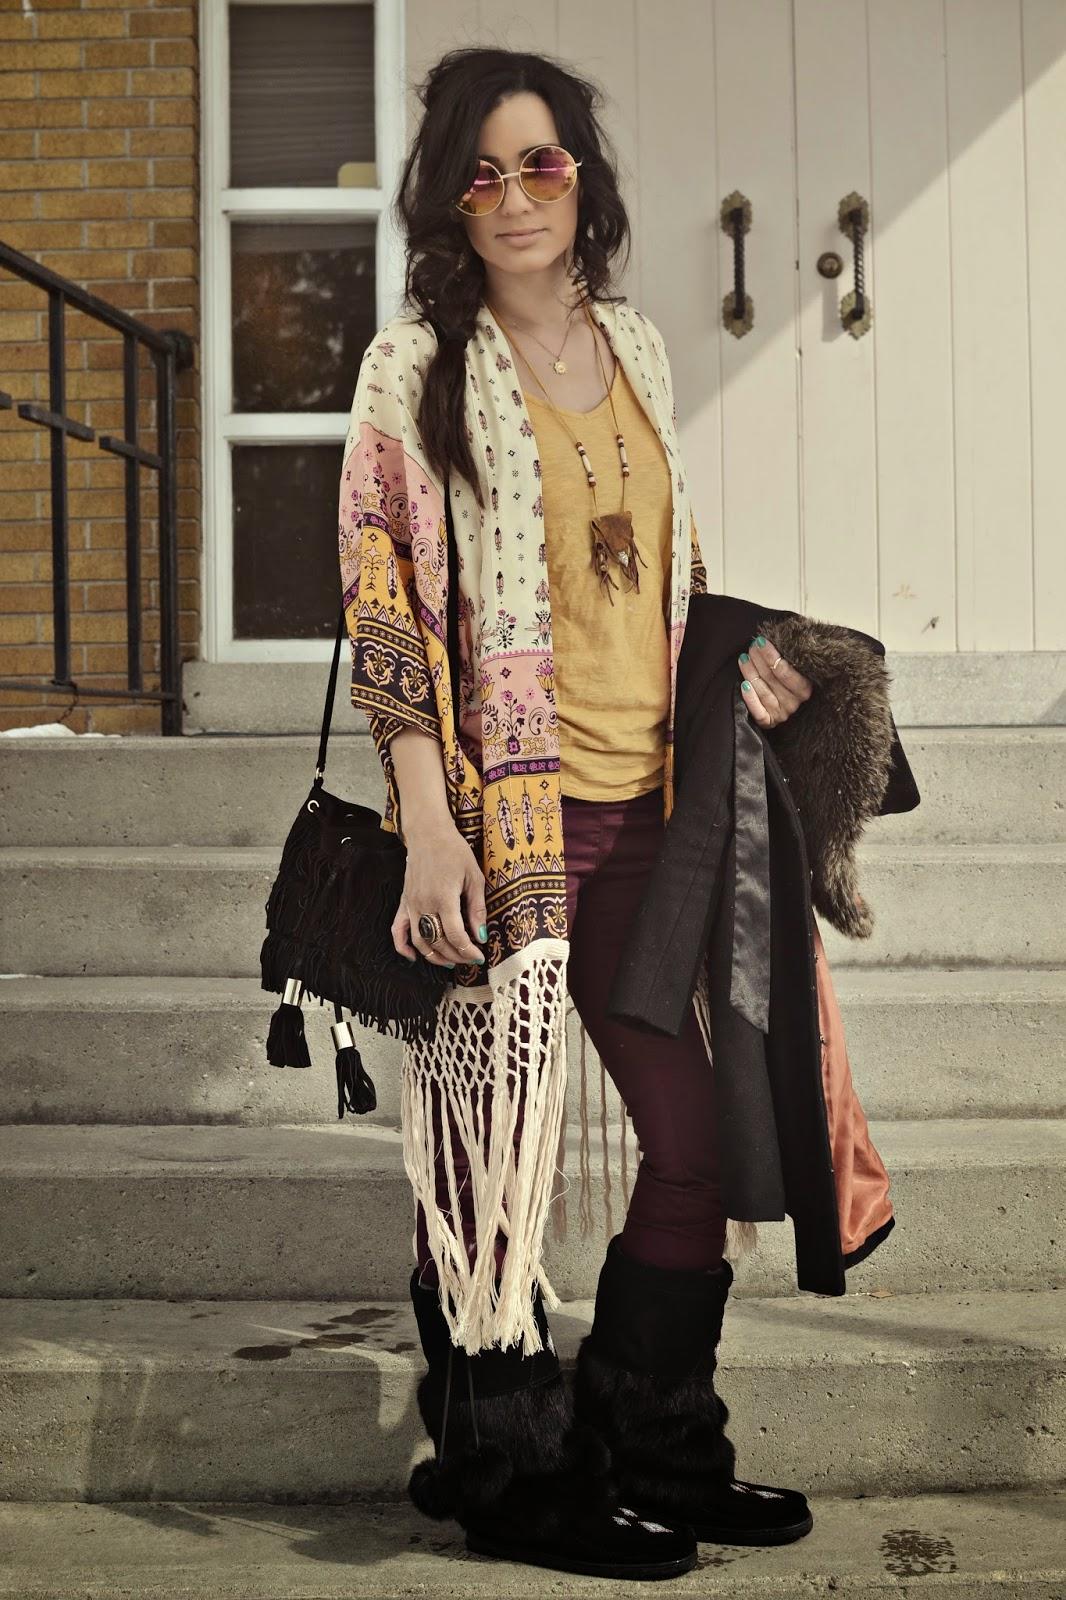 fabelhafte hippie outfit selber machen fotos erindzain. Black Bedroom Furniture Sets. Home Design Ideas